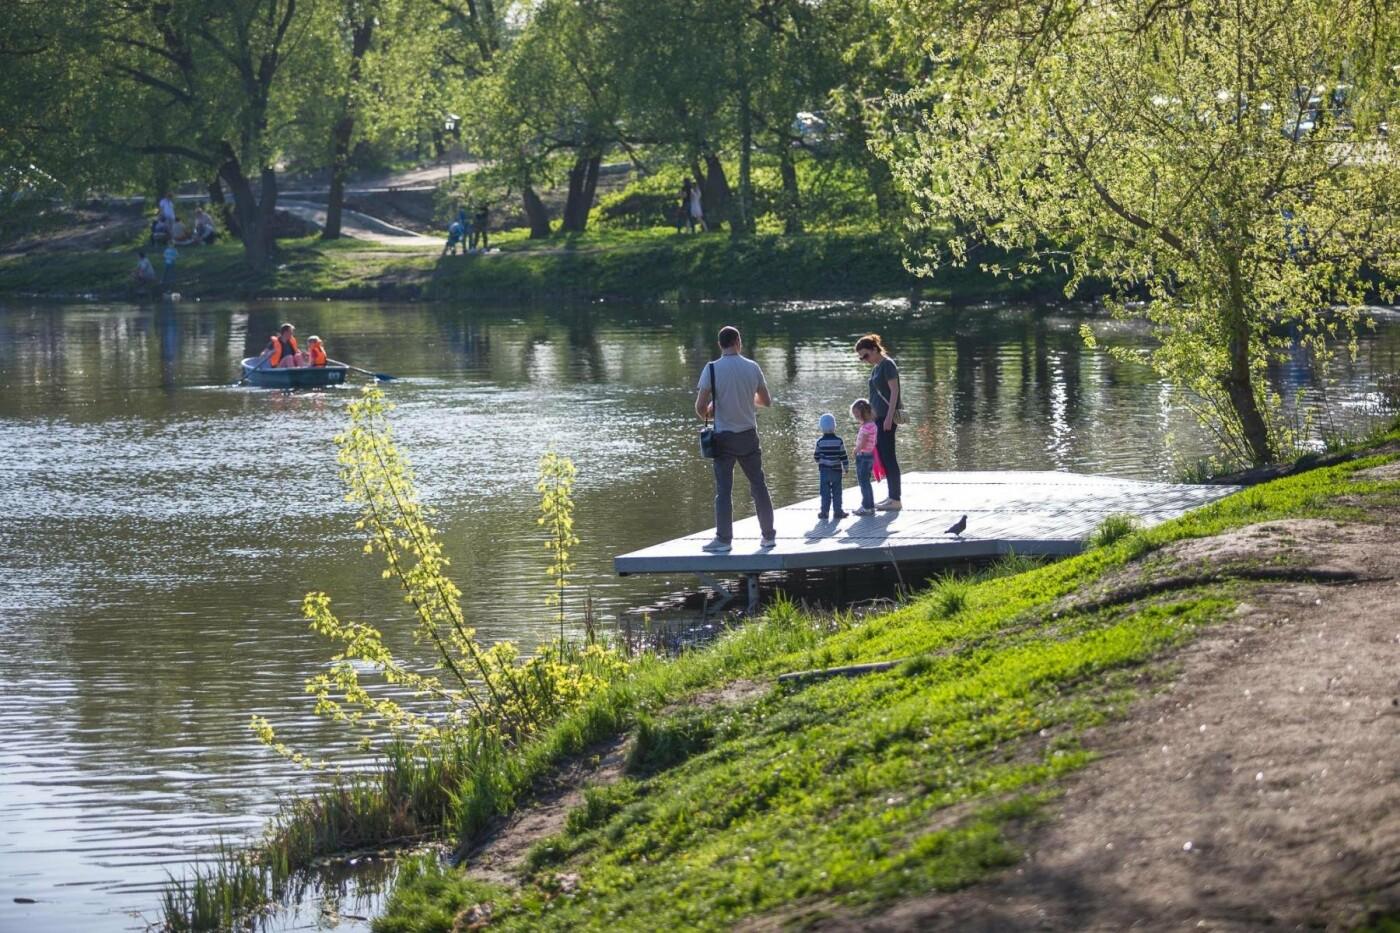 Весна на набережной Везёлки (фоторепортаж), фото-19